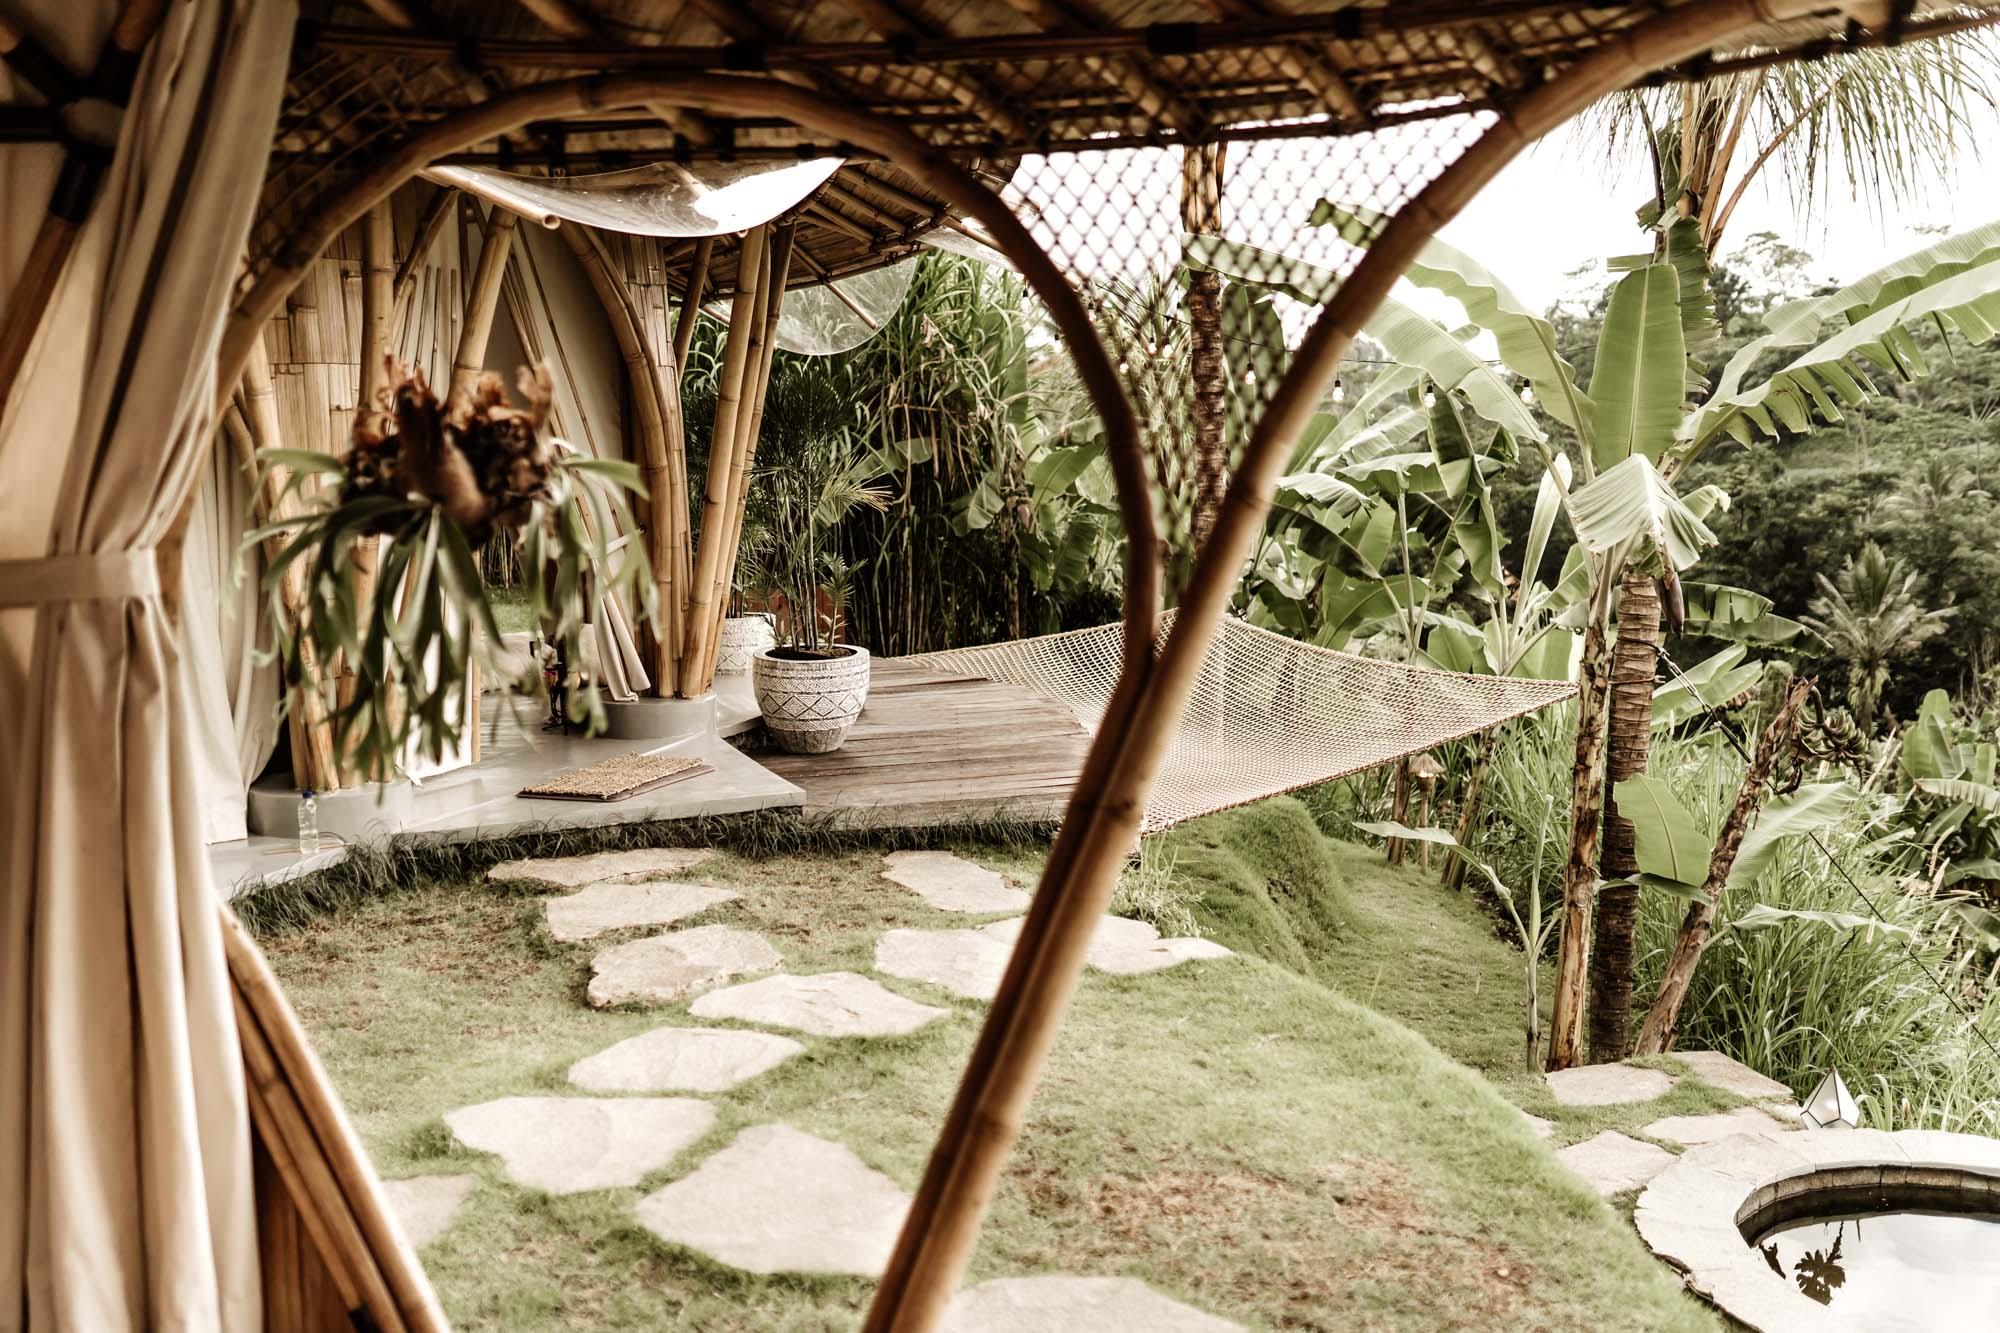 keira-mason-camaya-bali-bedroom-views.jpg